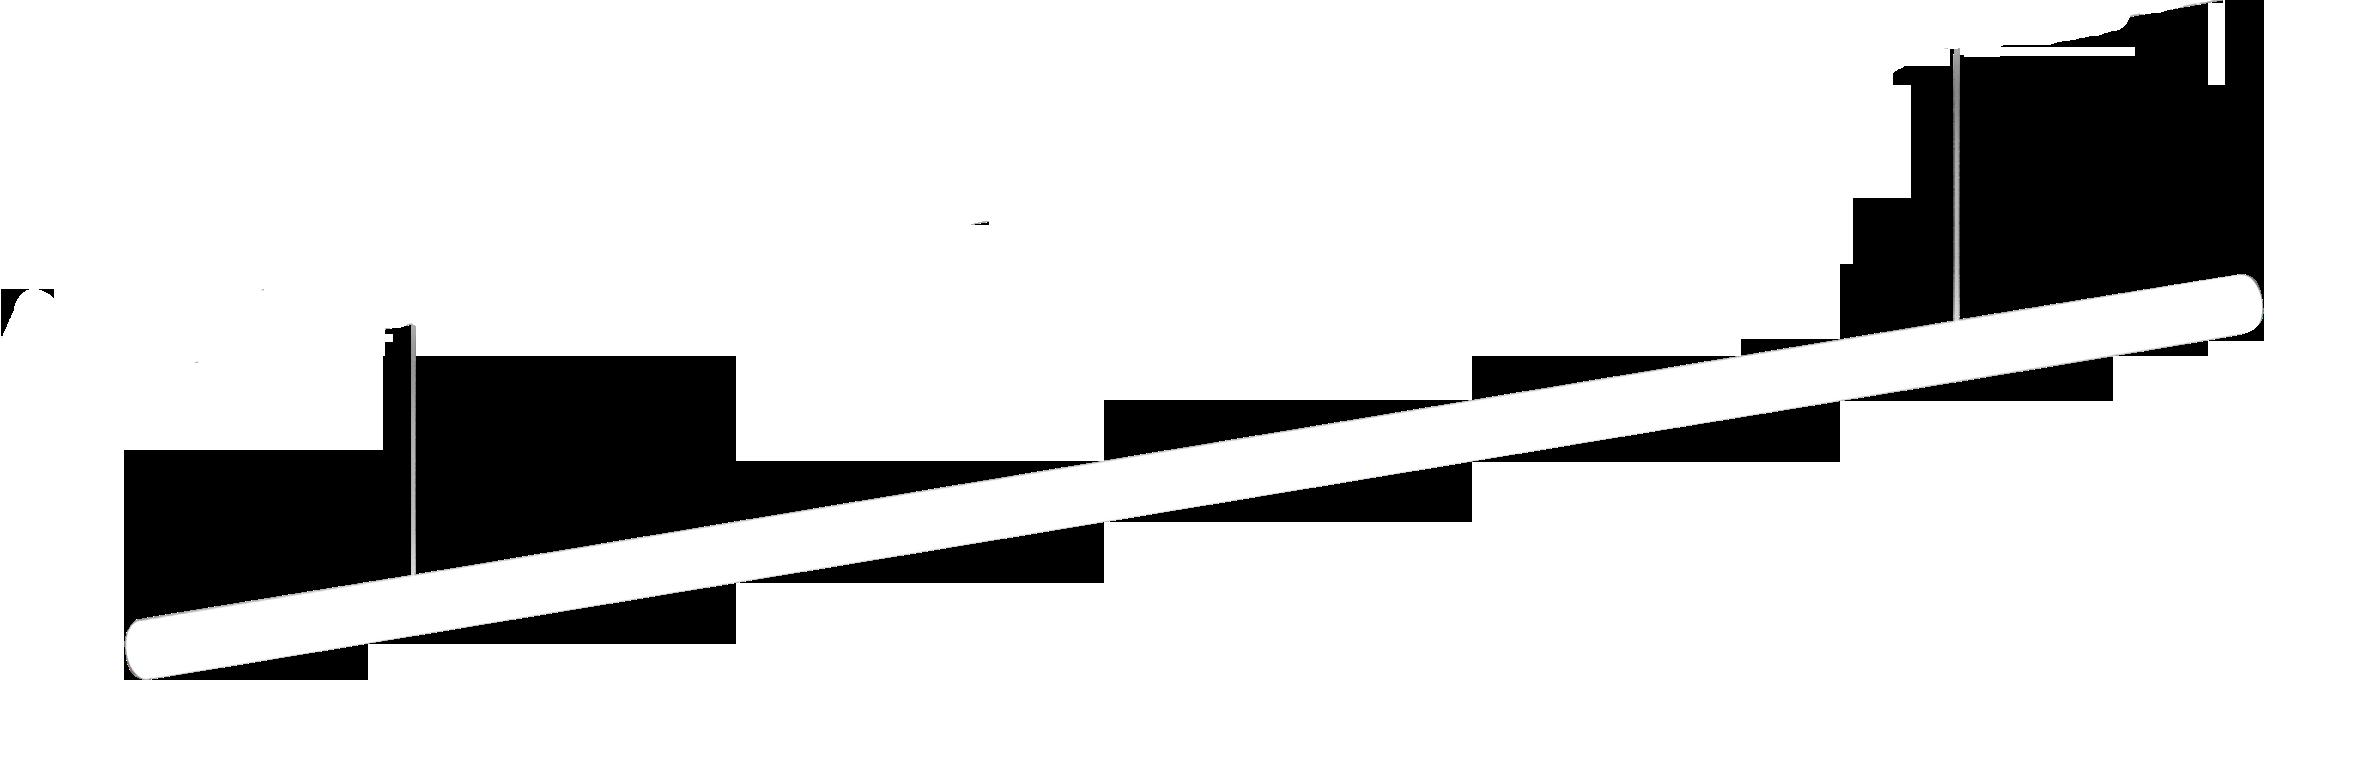 Artemide LED Light system ALPHABET OF LIGHT AoL SYSTEM S LIN.180 MAST. TERM. 3500K